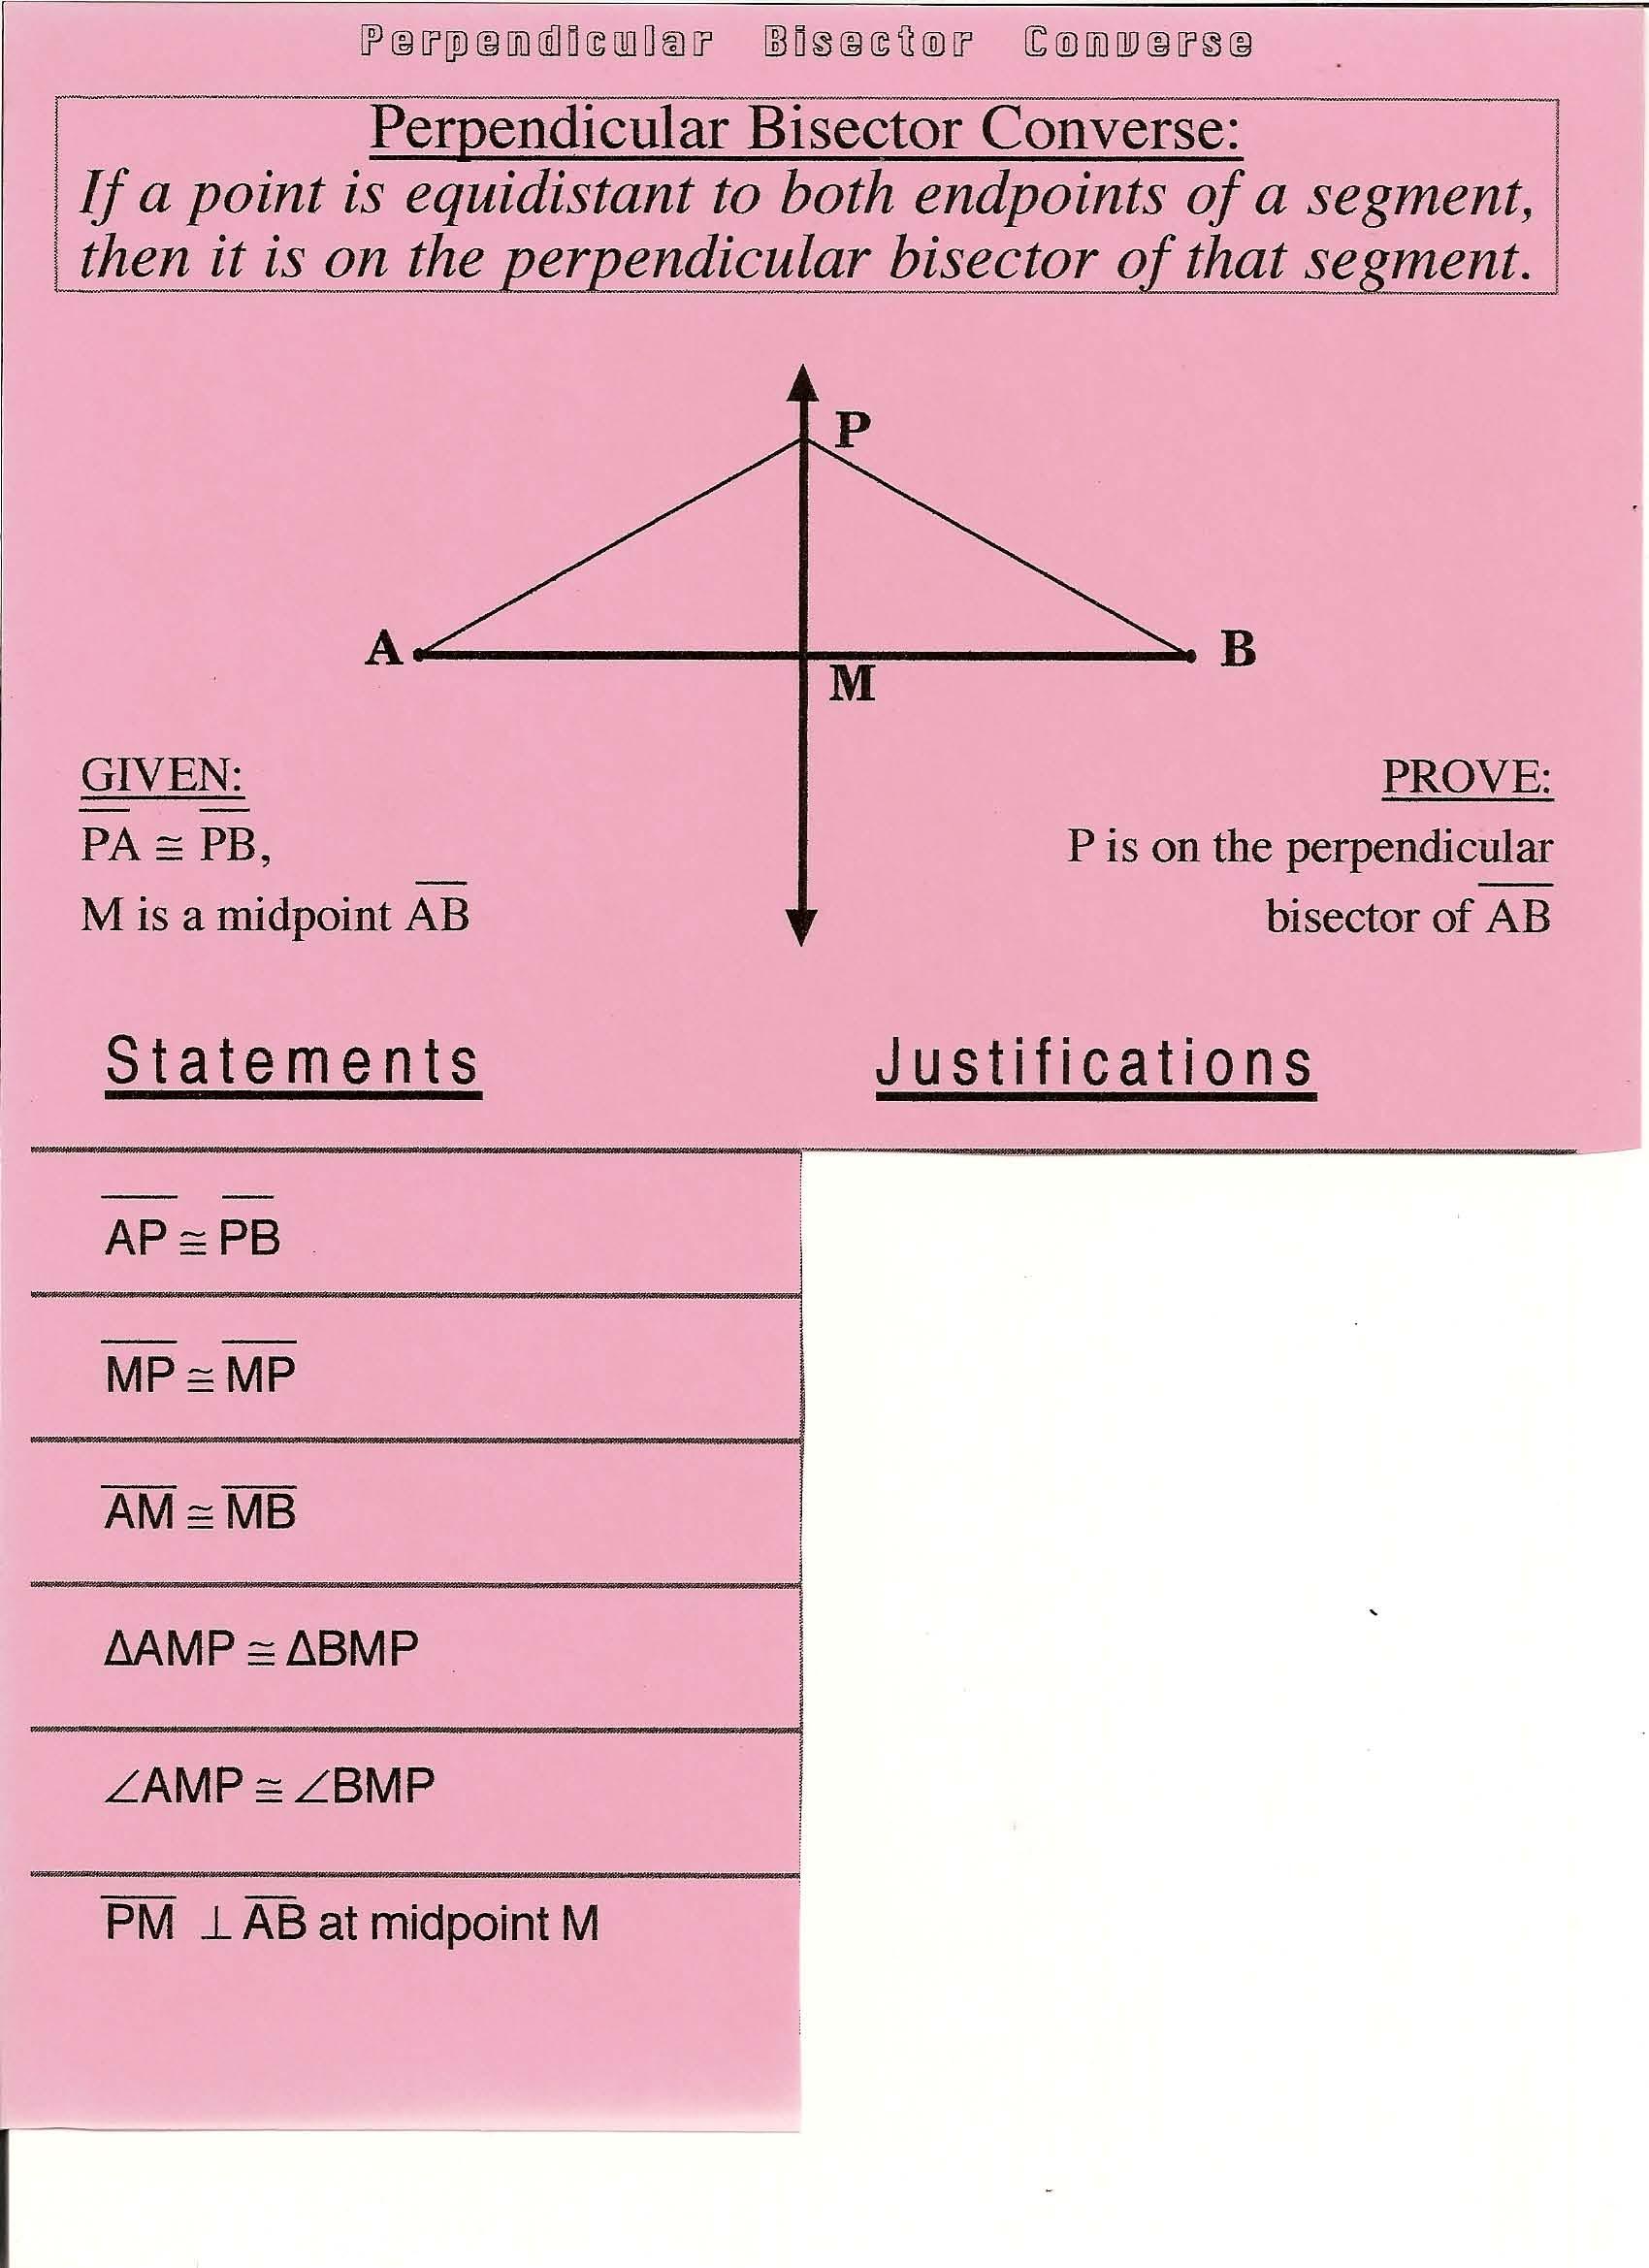 Worksheets Perpendicular Bisector Worksheet perpendicular bisector worksheet free worksheets library angle problems